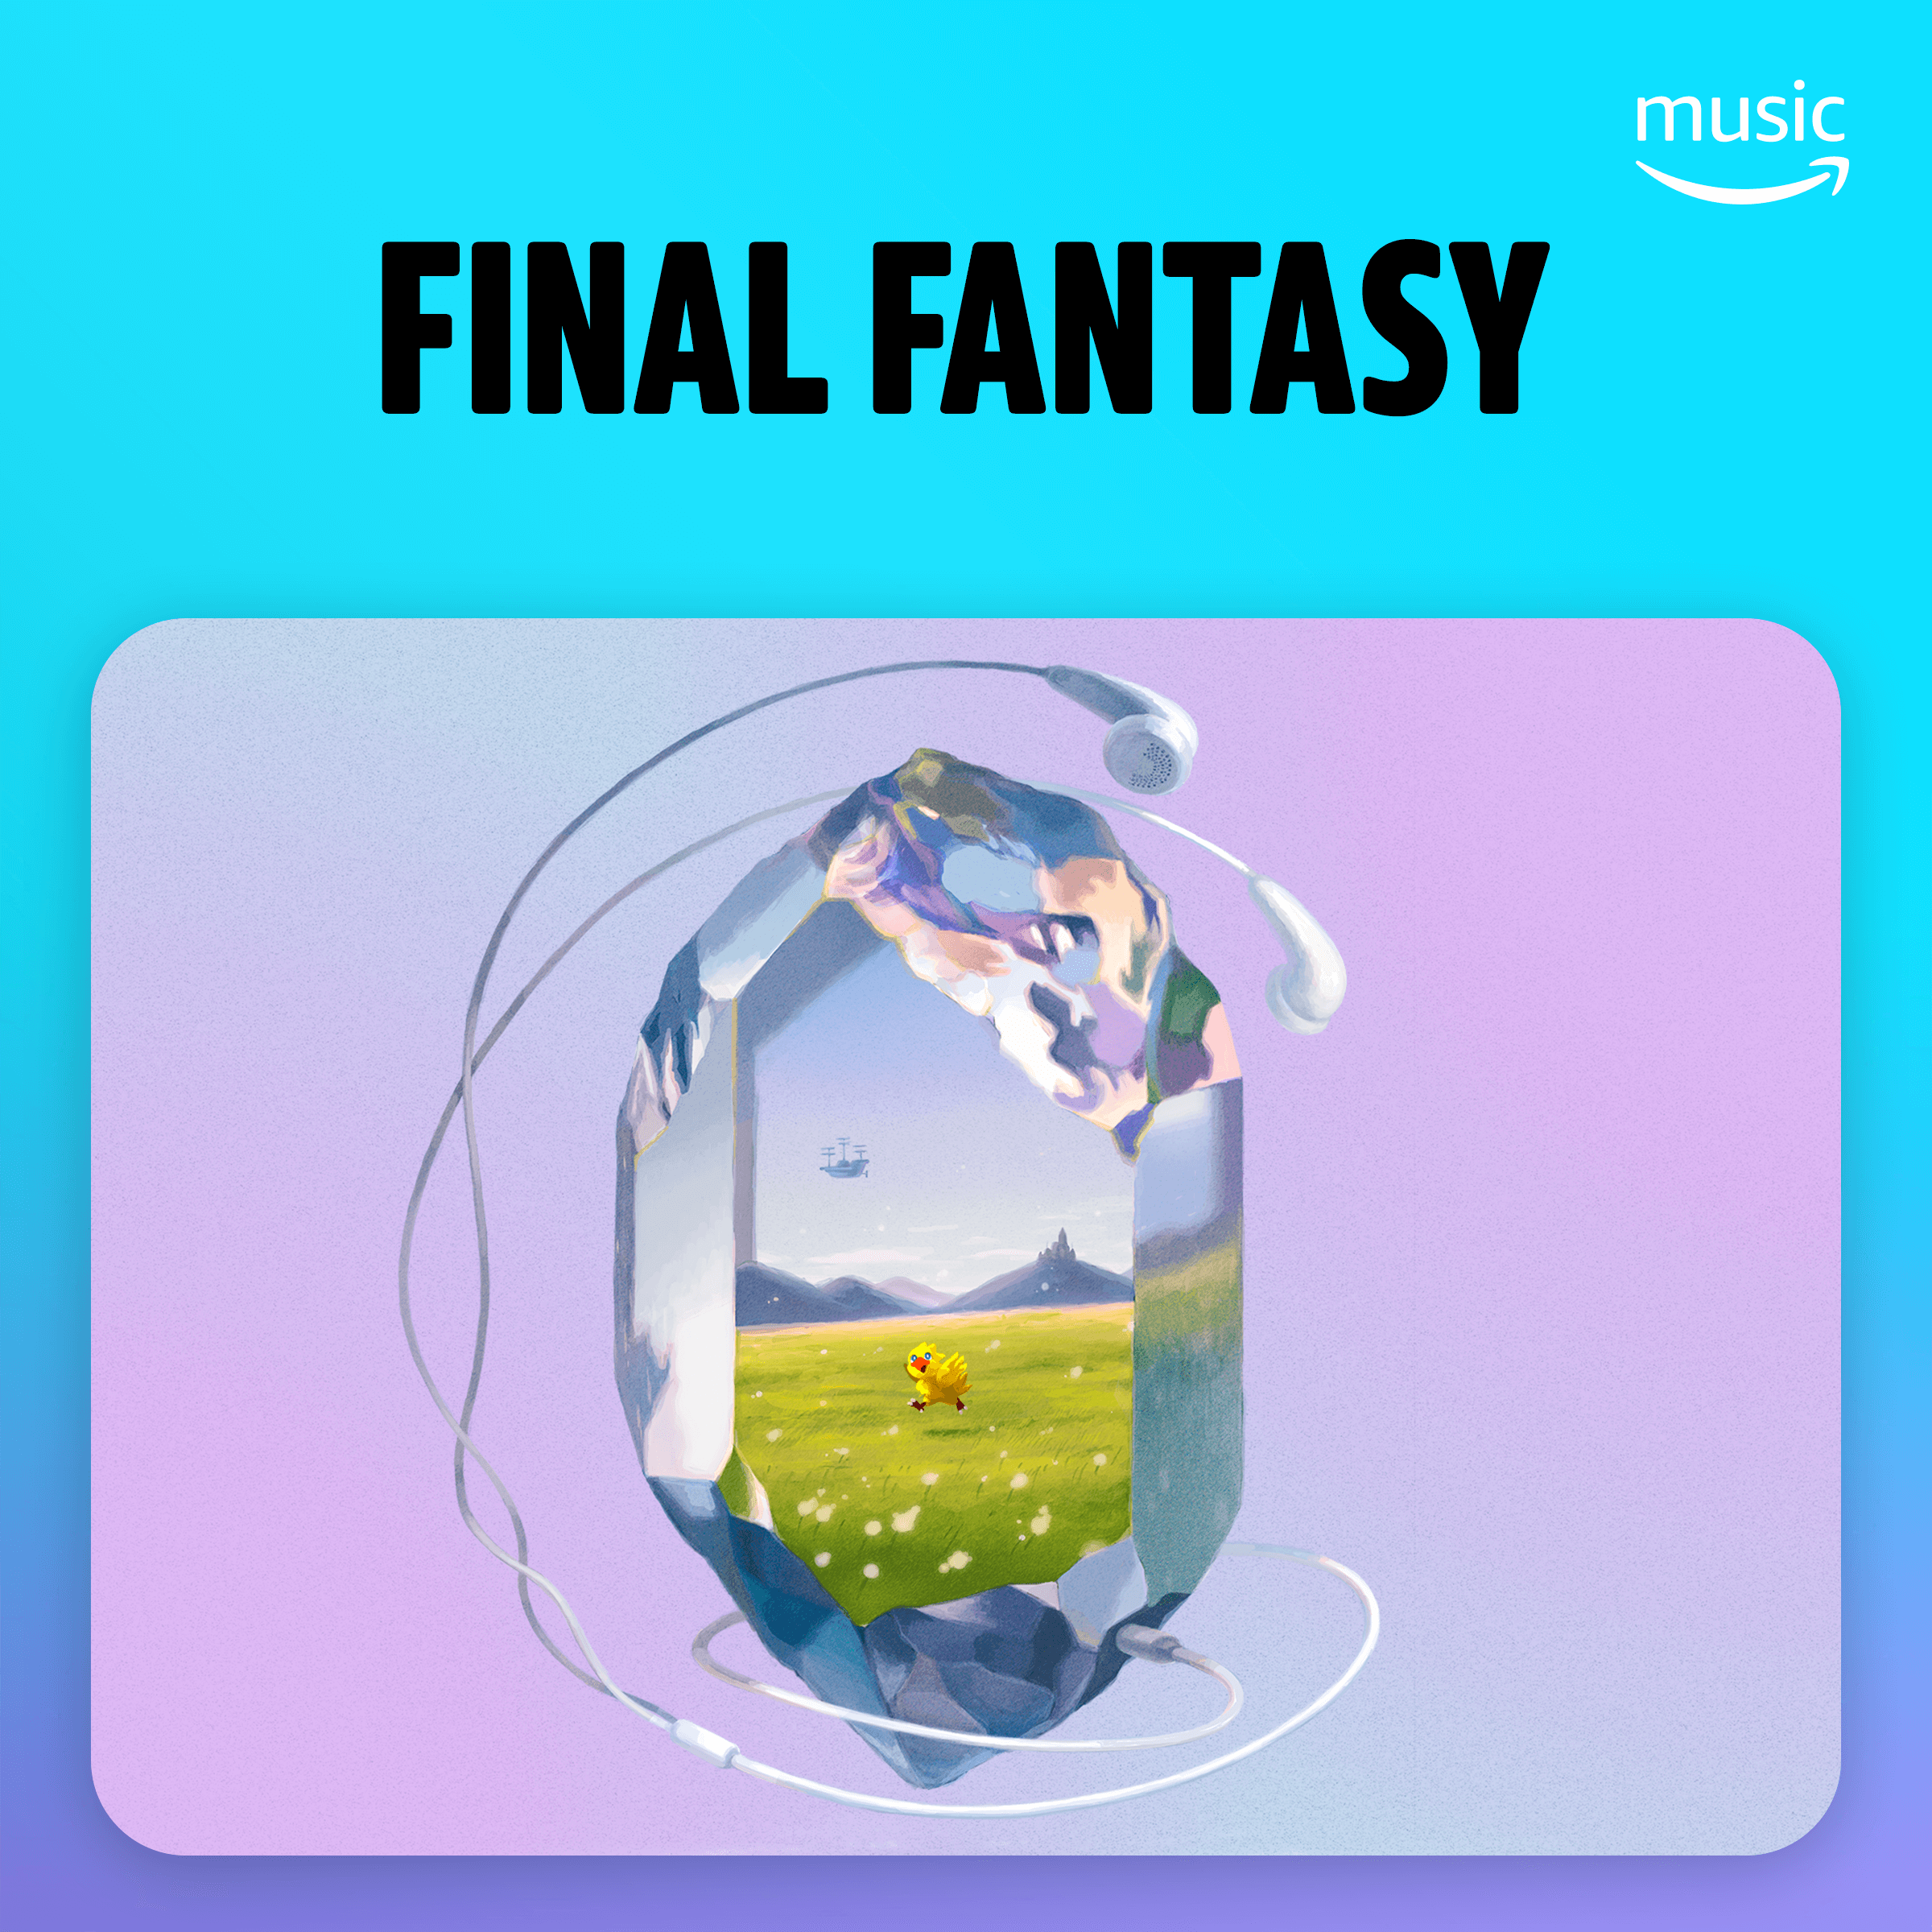 FINAL FANTASY GAME MUSIC